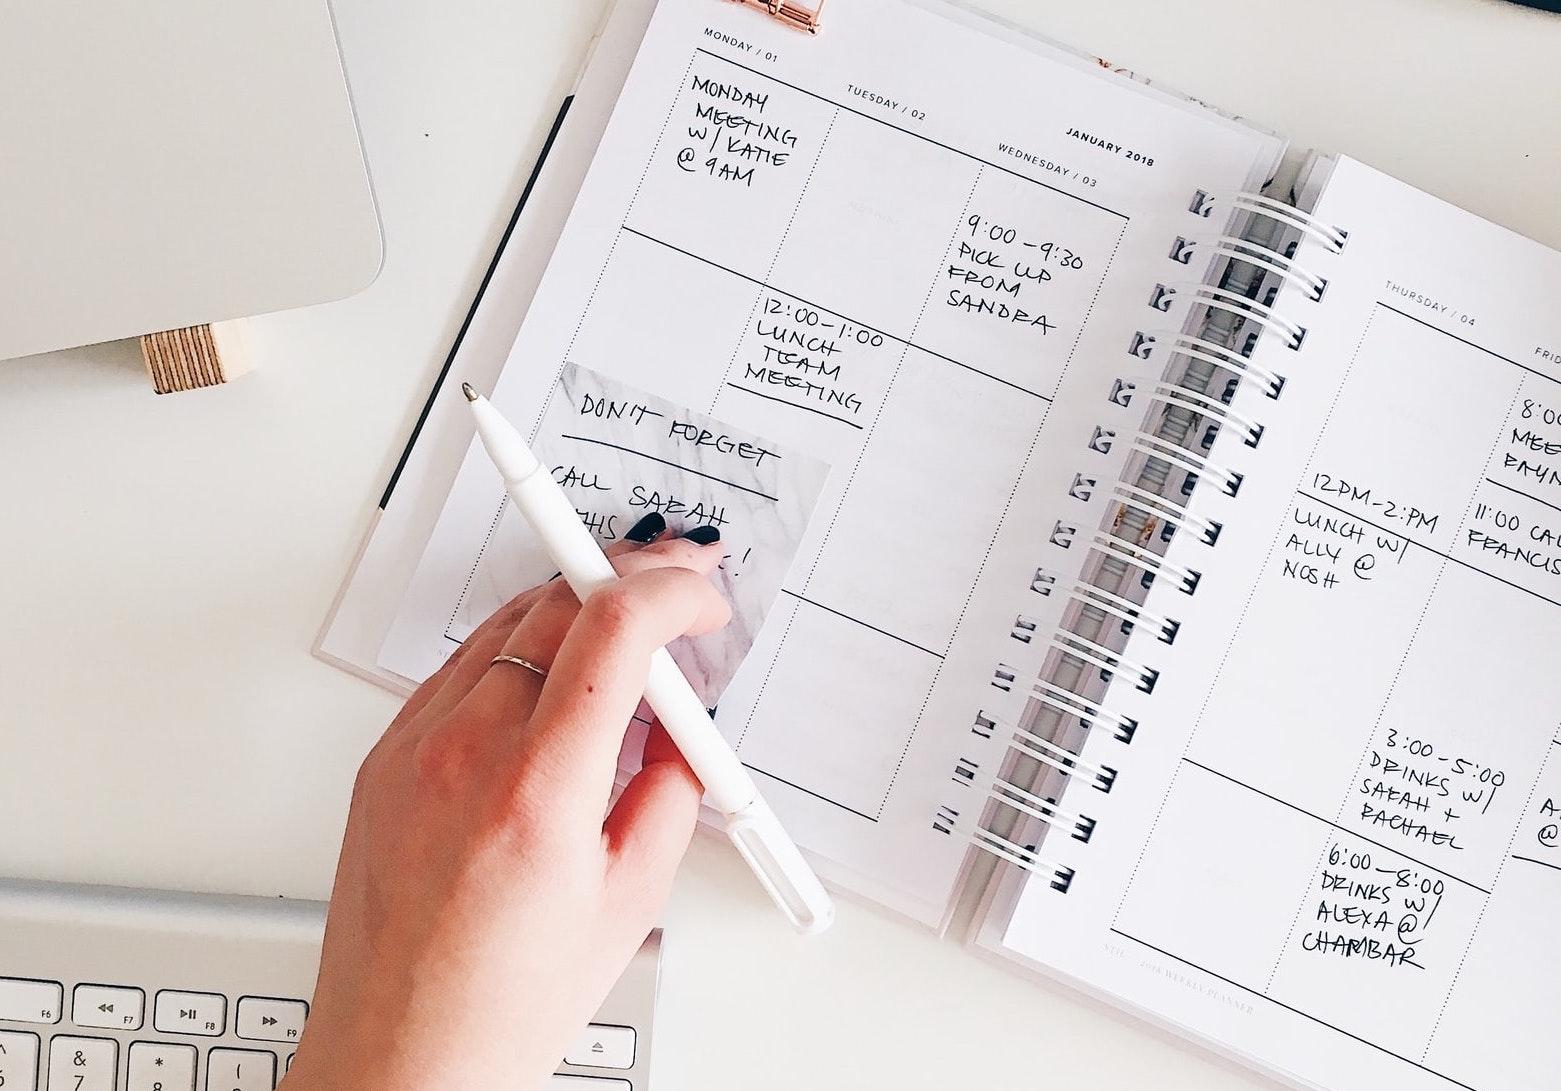 Hand adding reminder to calendar notebook